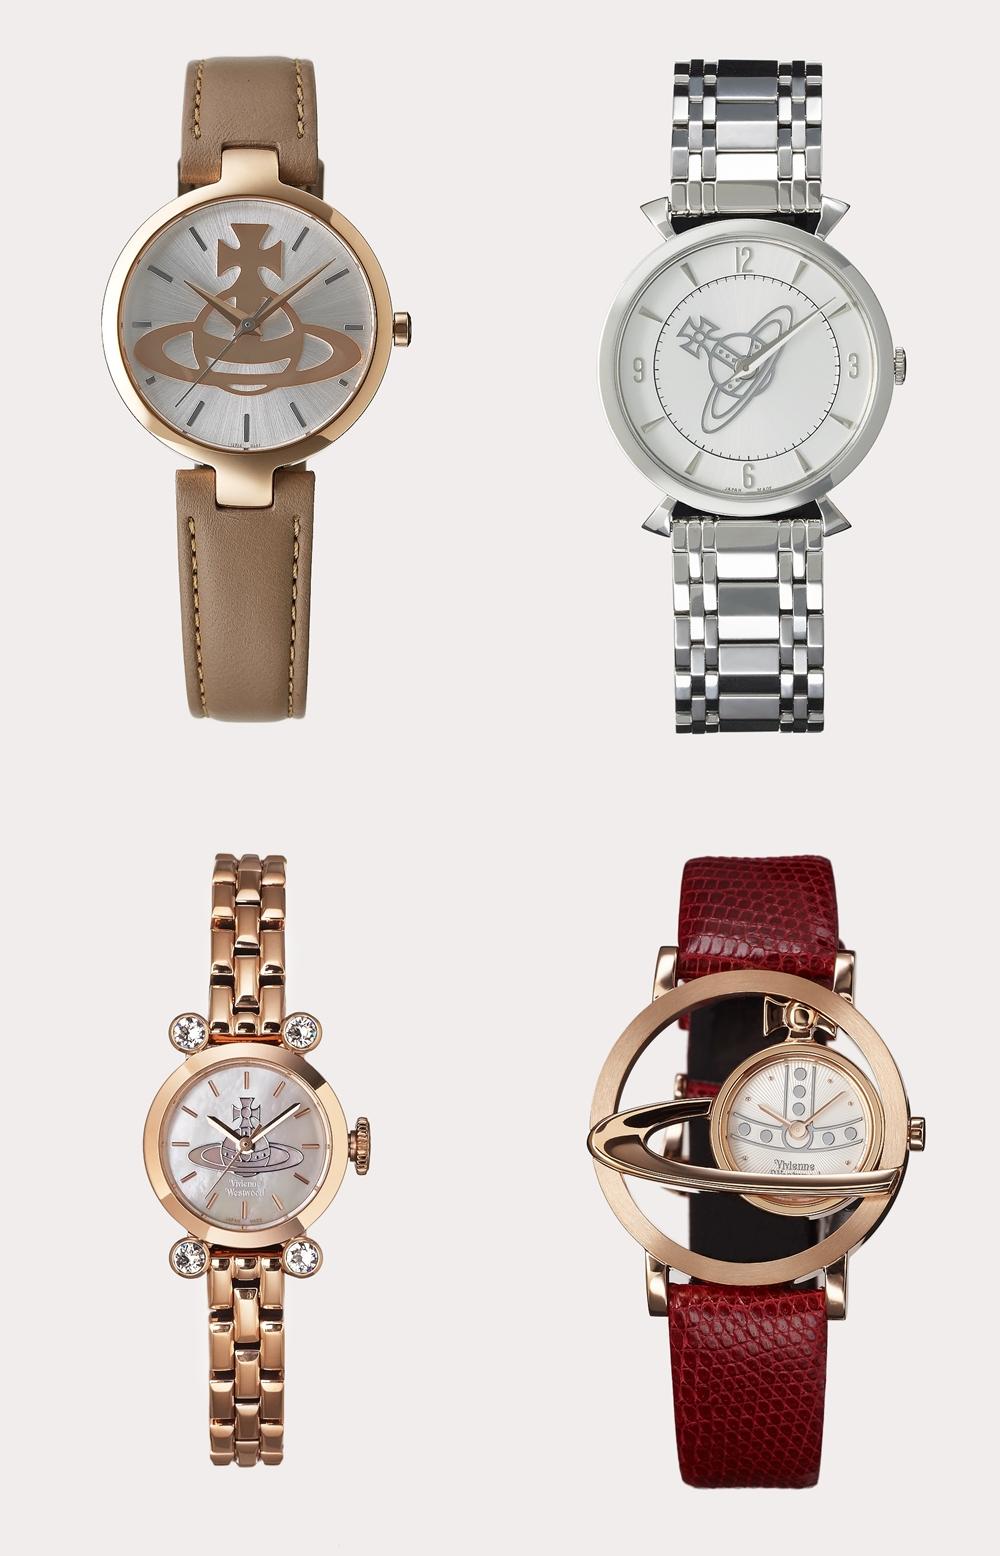 Vivienne Westwood(ヴィヴィアンウエストウッド) watch デザイン 腕時計